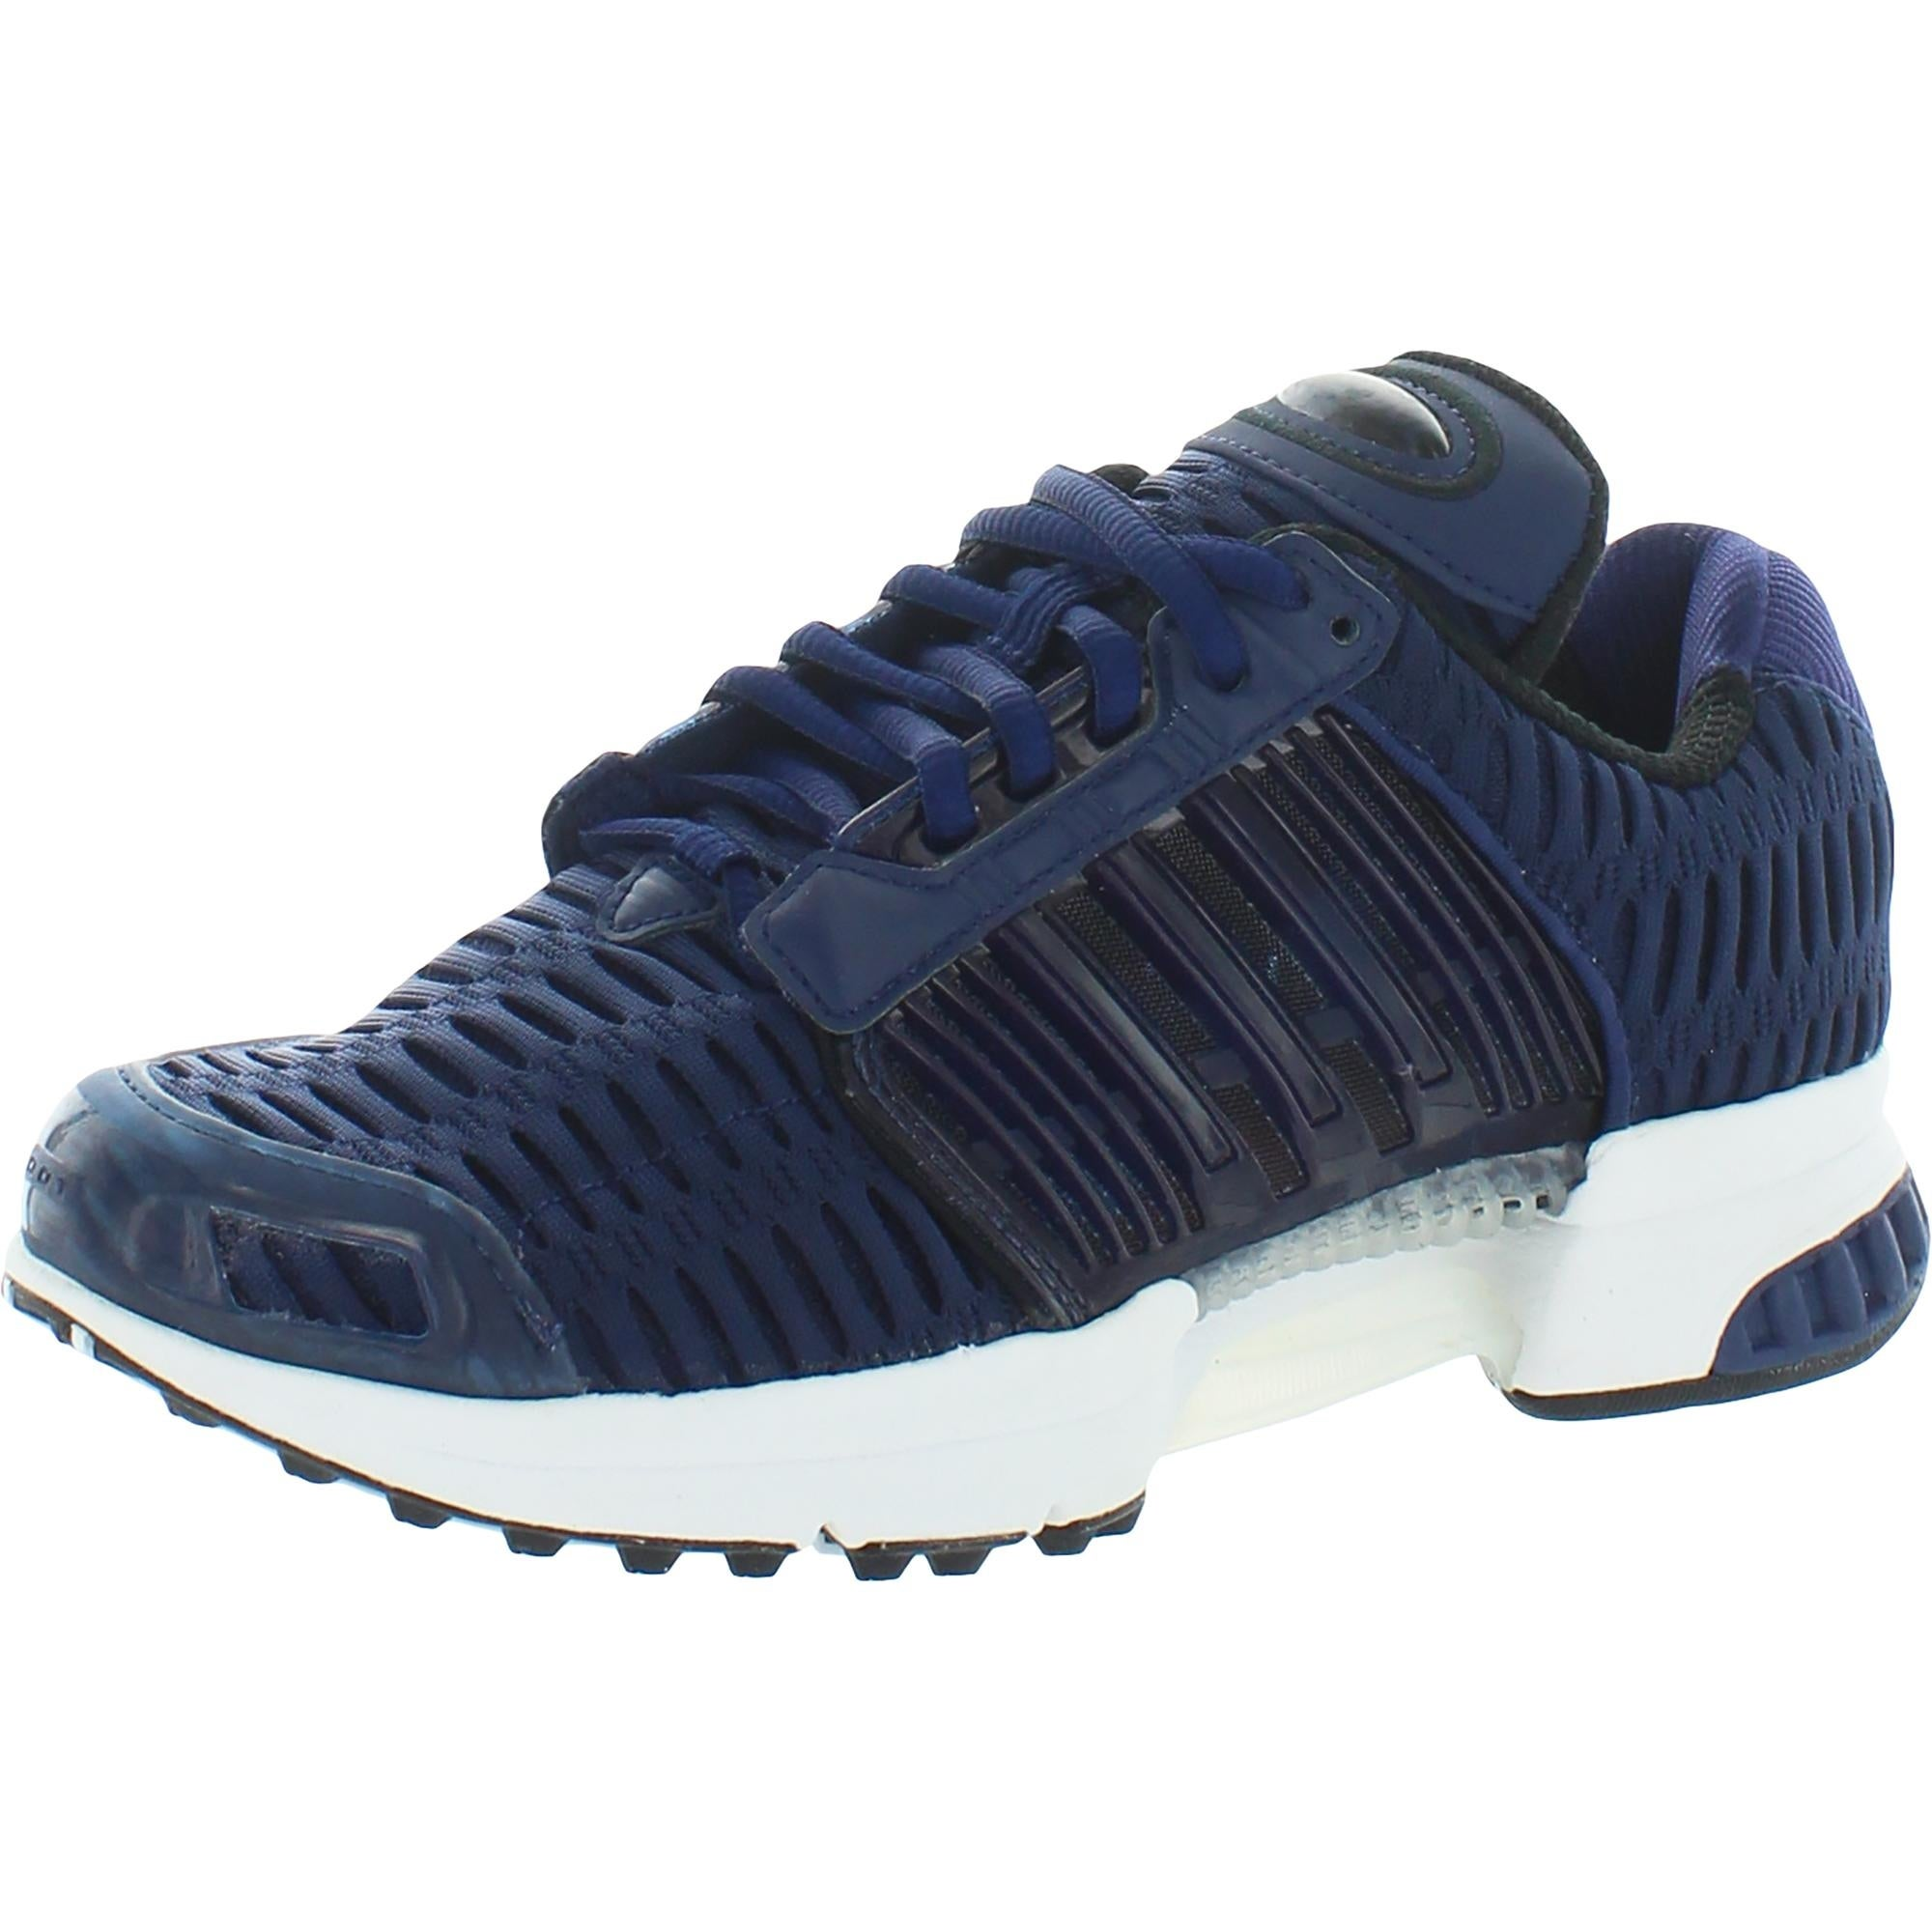 adidas Originals Mens Clima Cool 1 Running Shoes Knit Sneakers - Dark Blue/Dark Blue/Footwear White